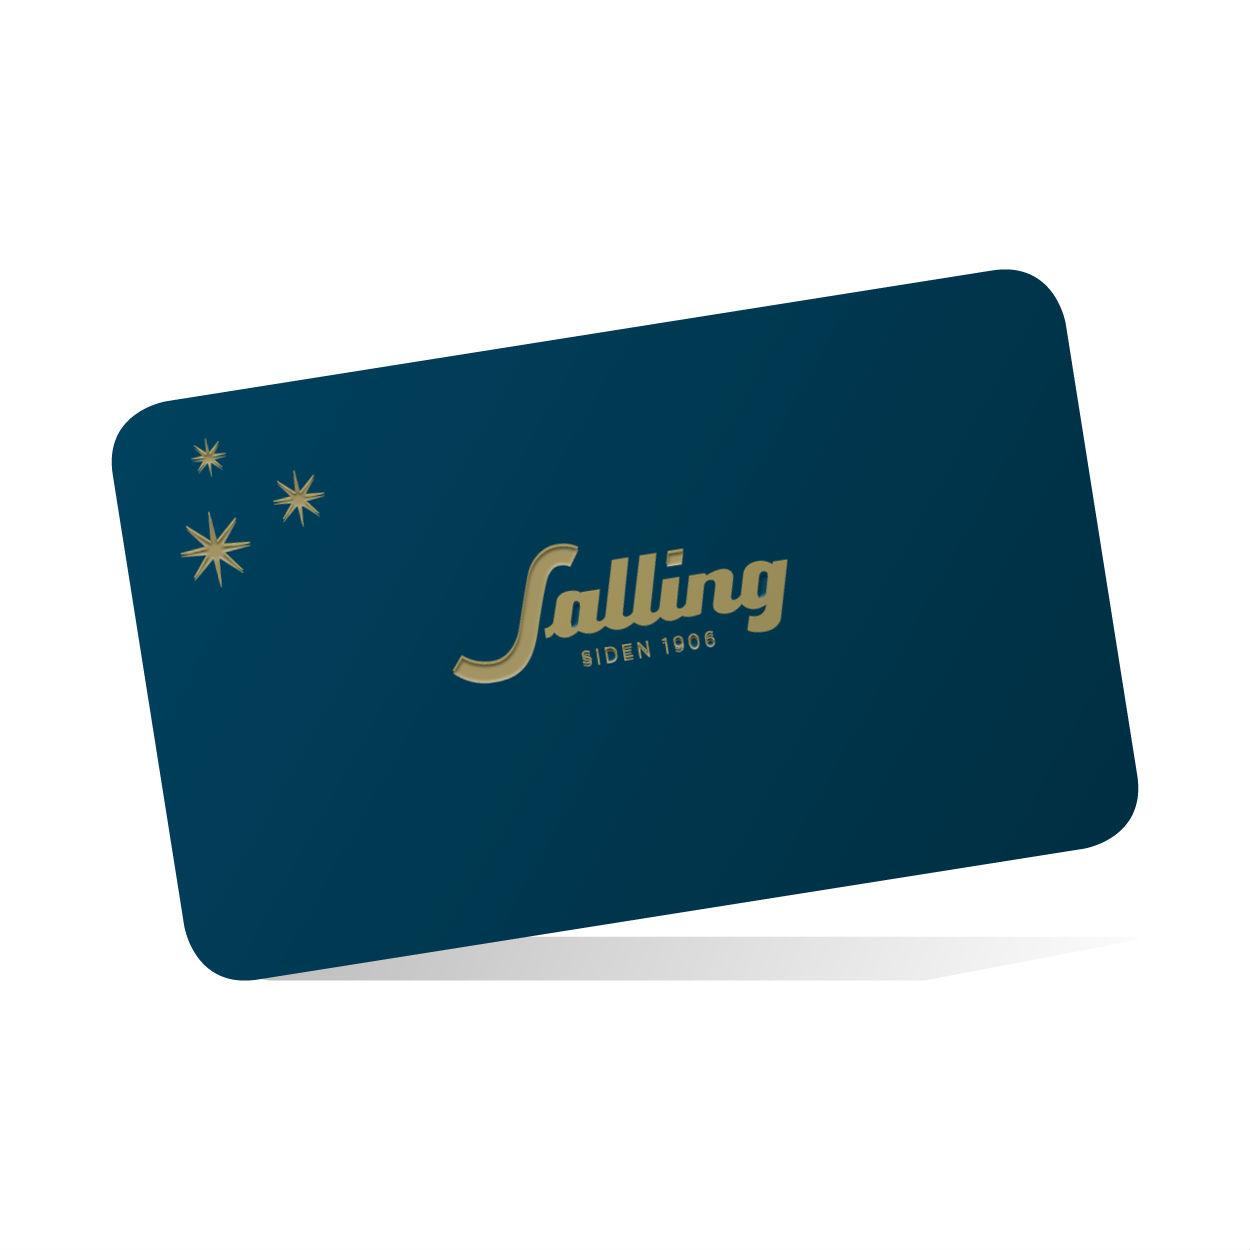 Salling gavekort - 650 kr